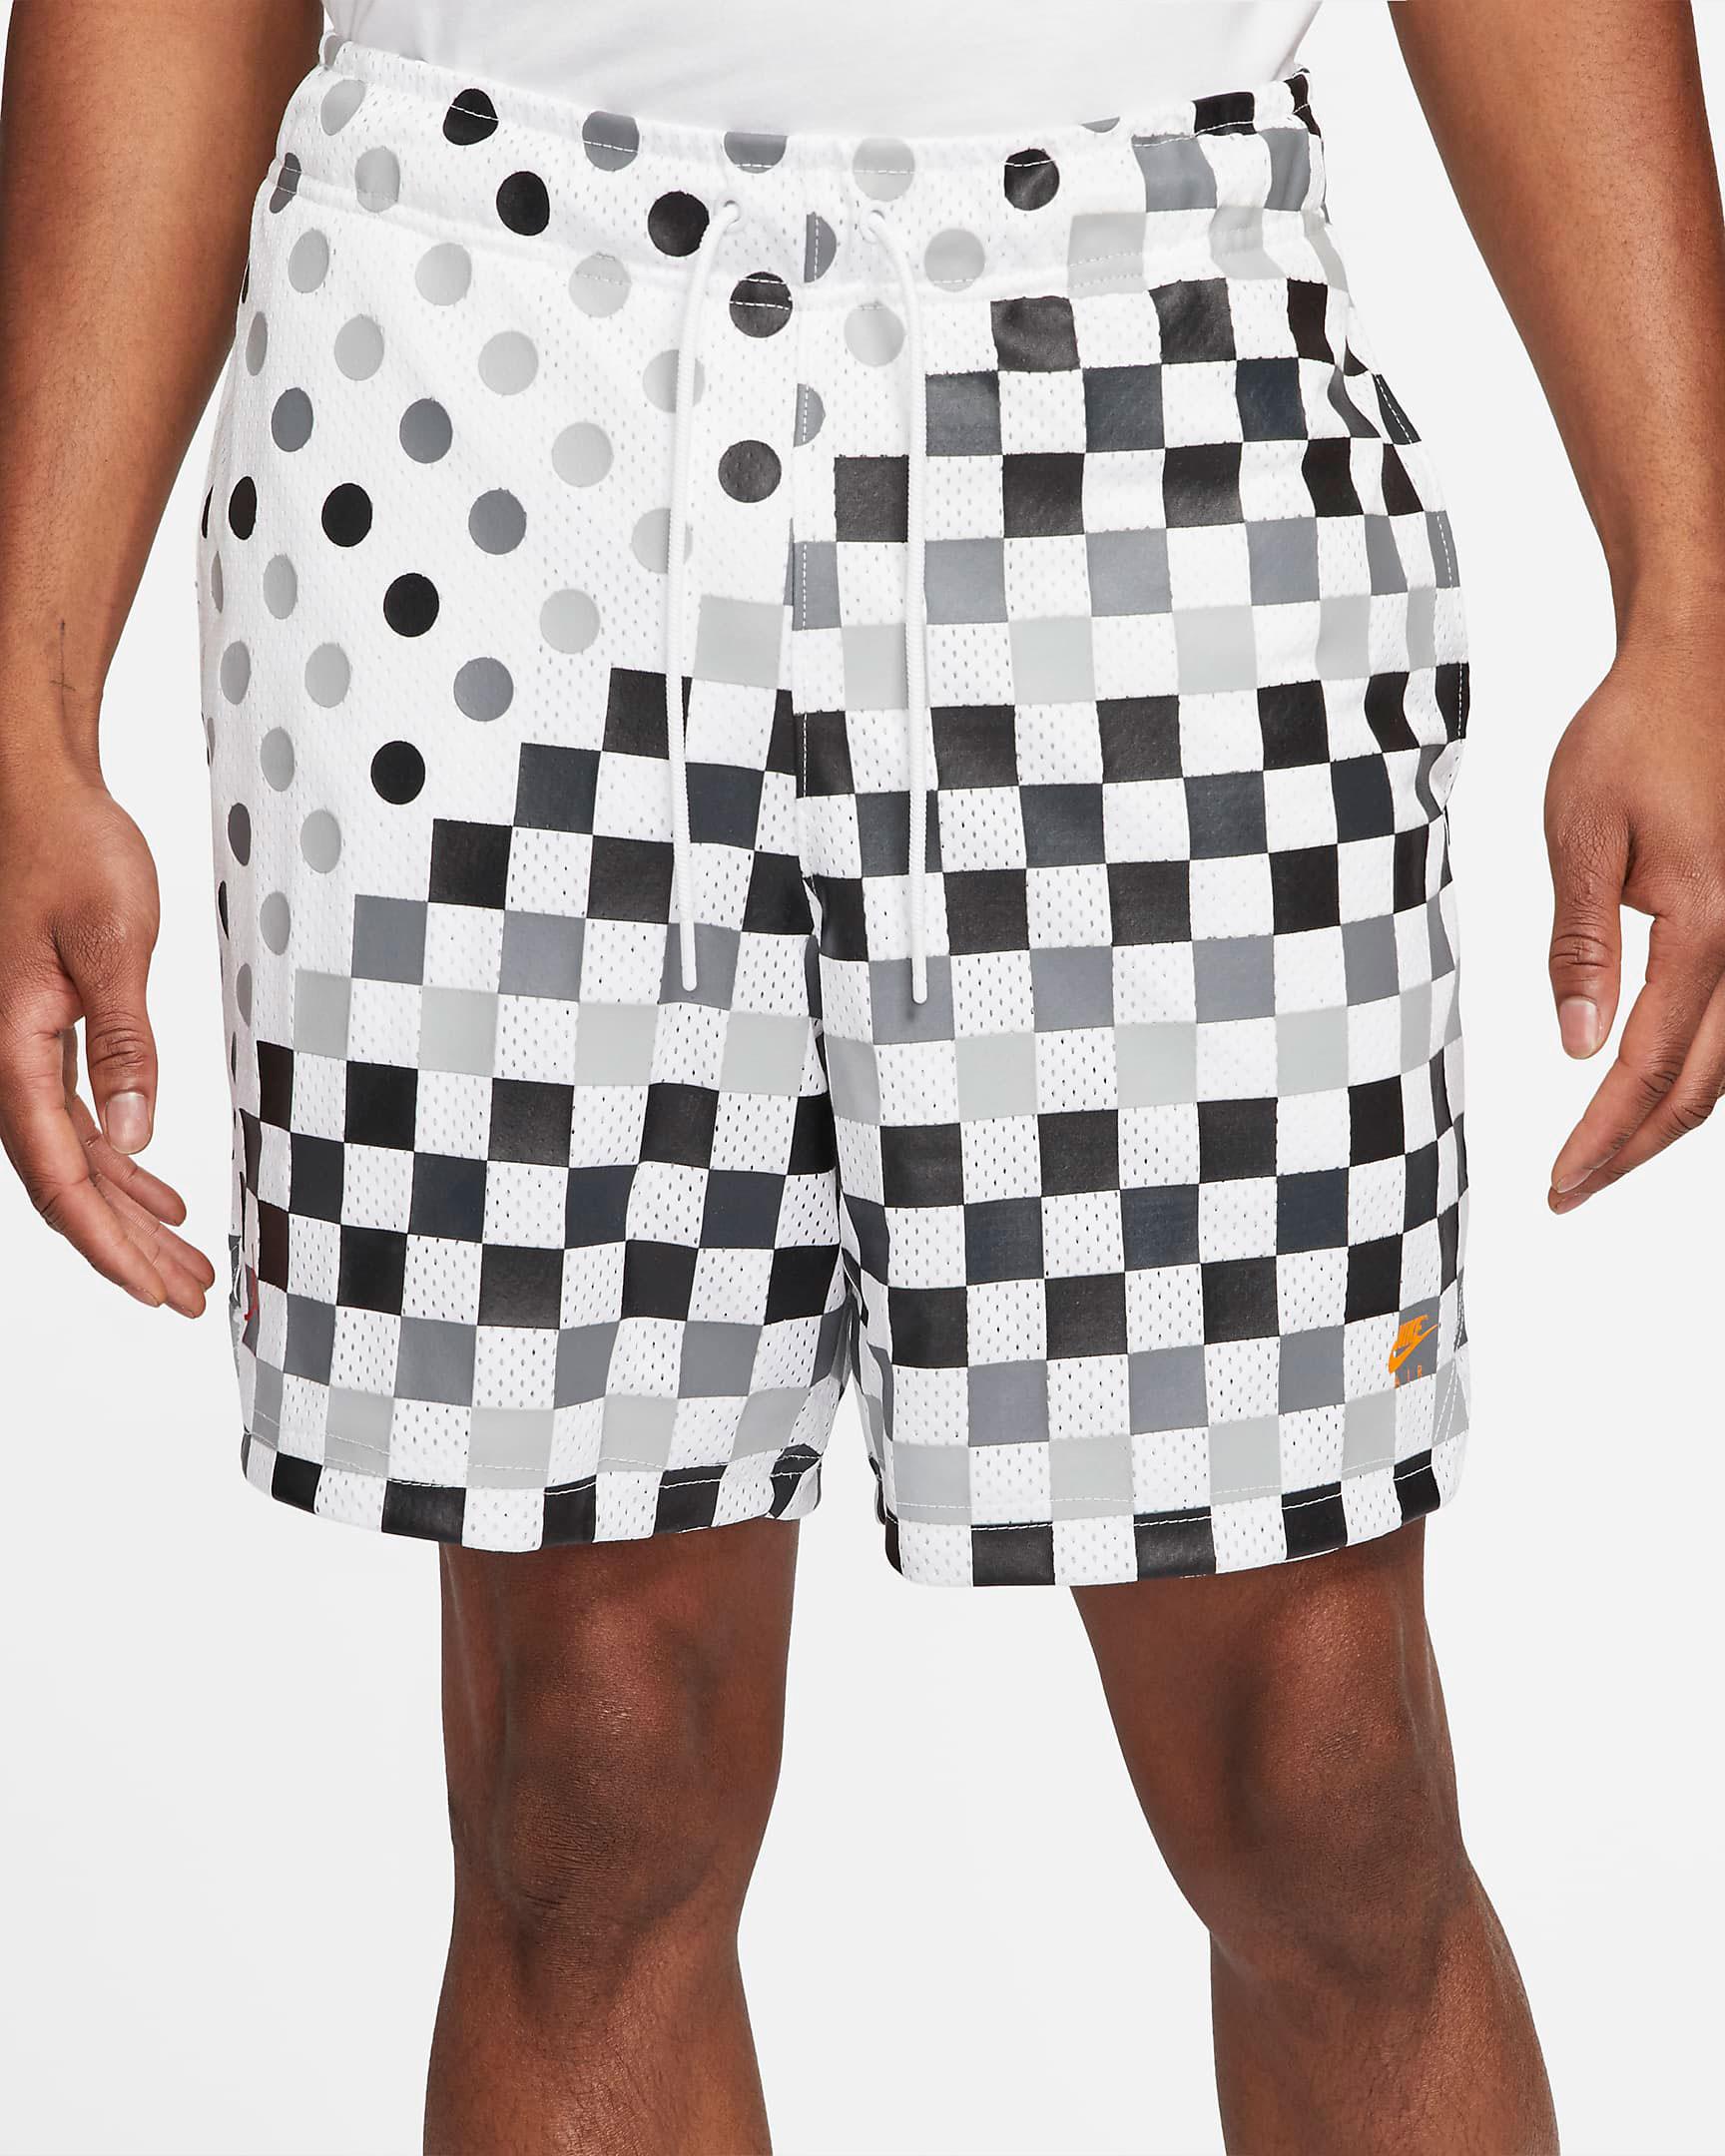 where-to-buy-air-jordan-3-cool-grey-2021-shorts-2